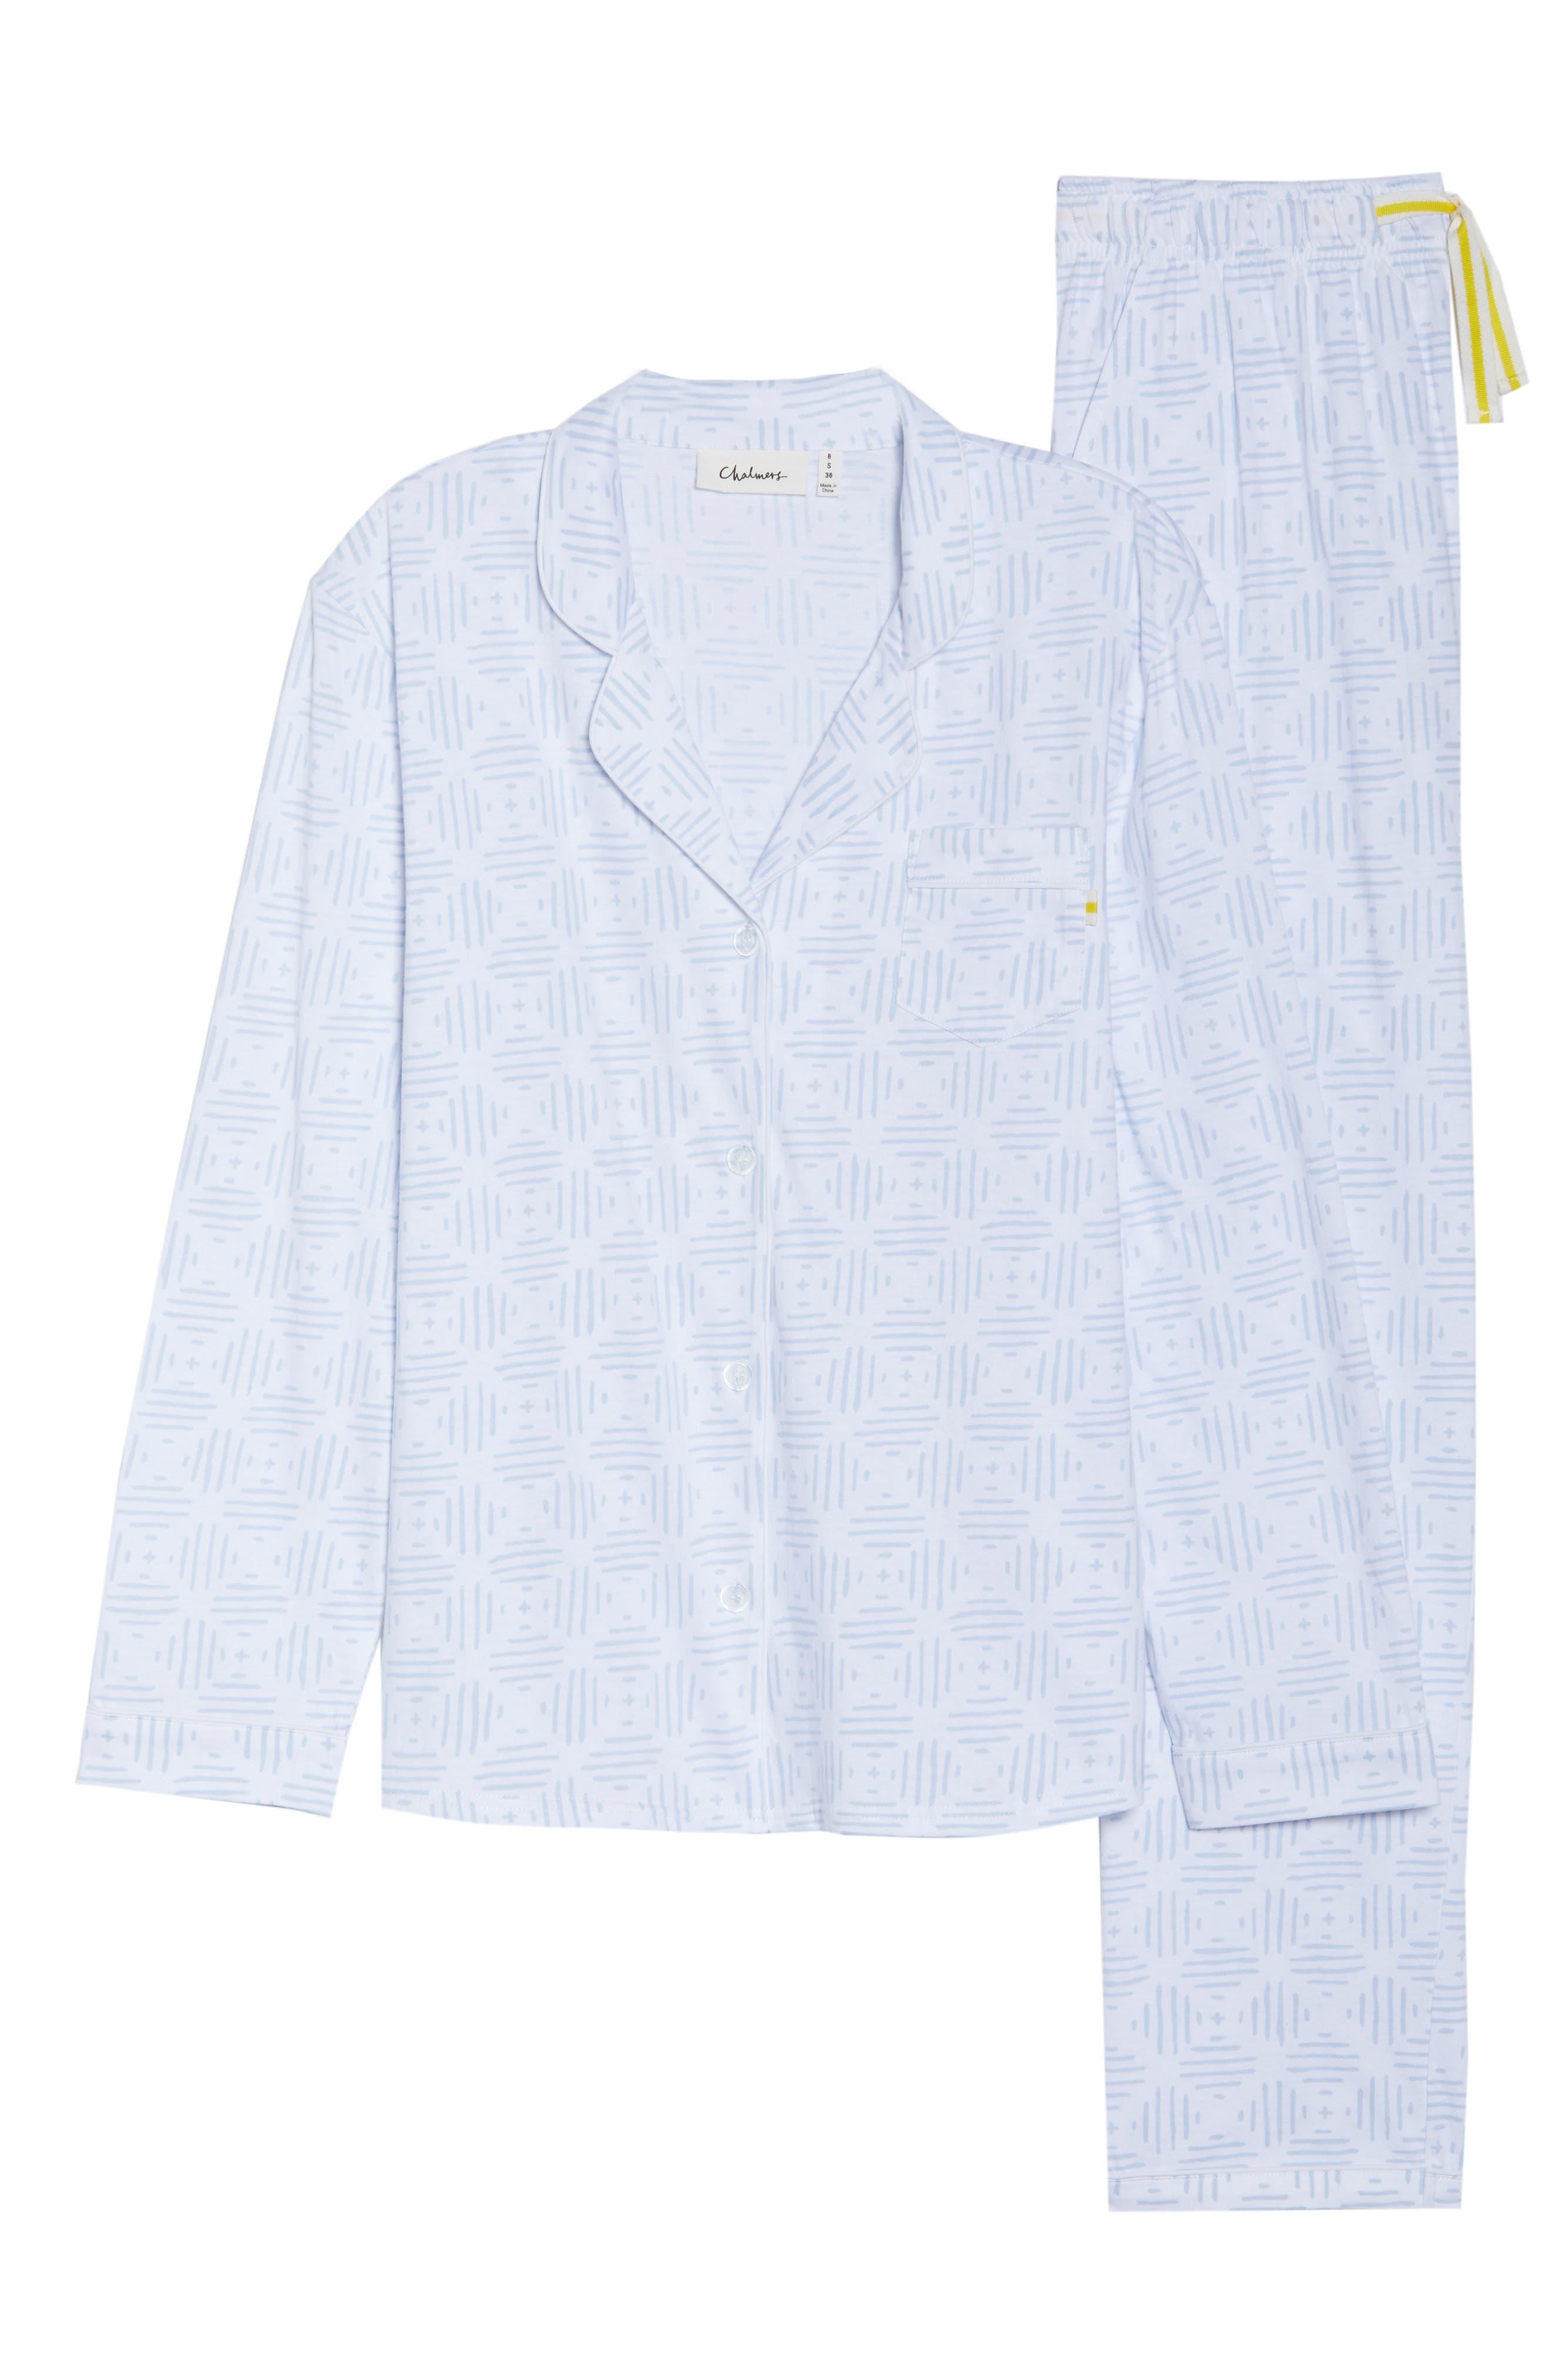 Moroccan Tile Pajamas,                             Alternate thumbnail 4, color,                             Moro Tile Blue